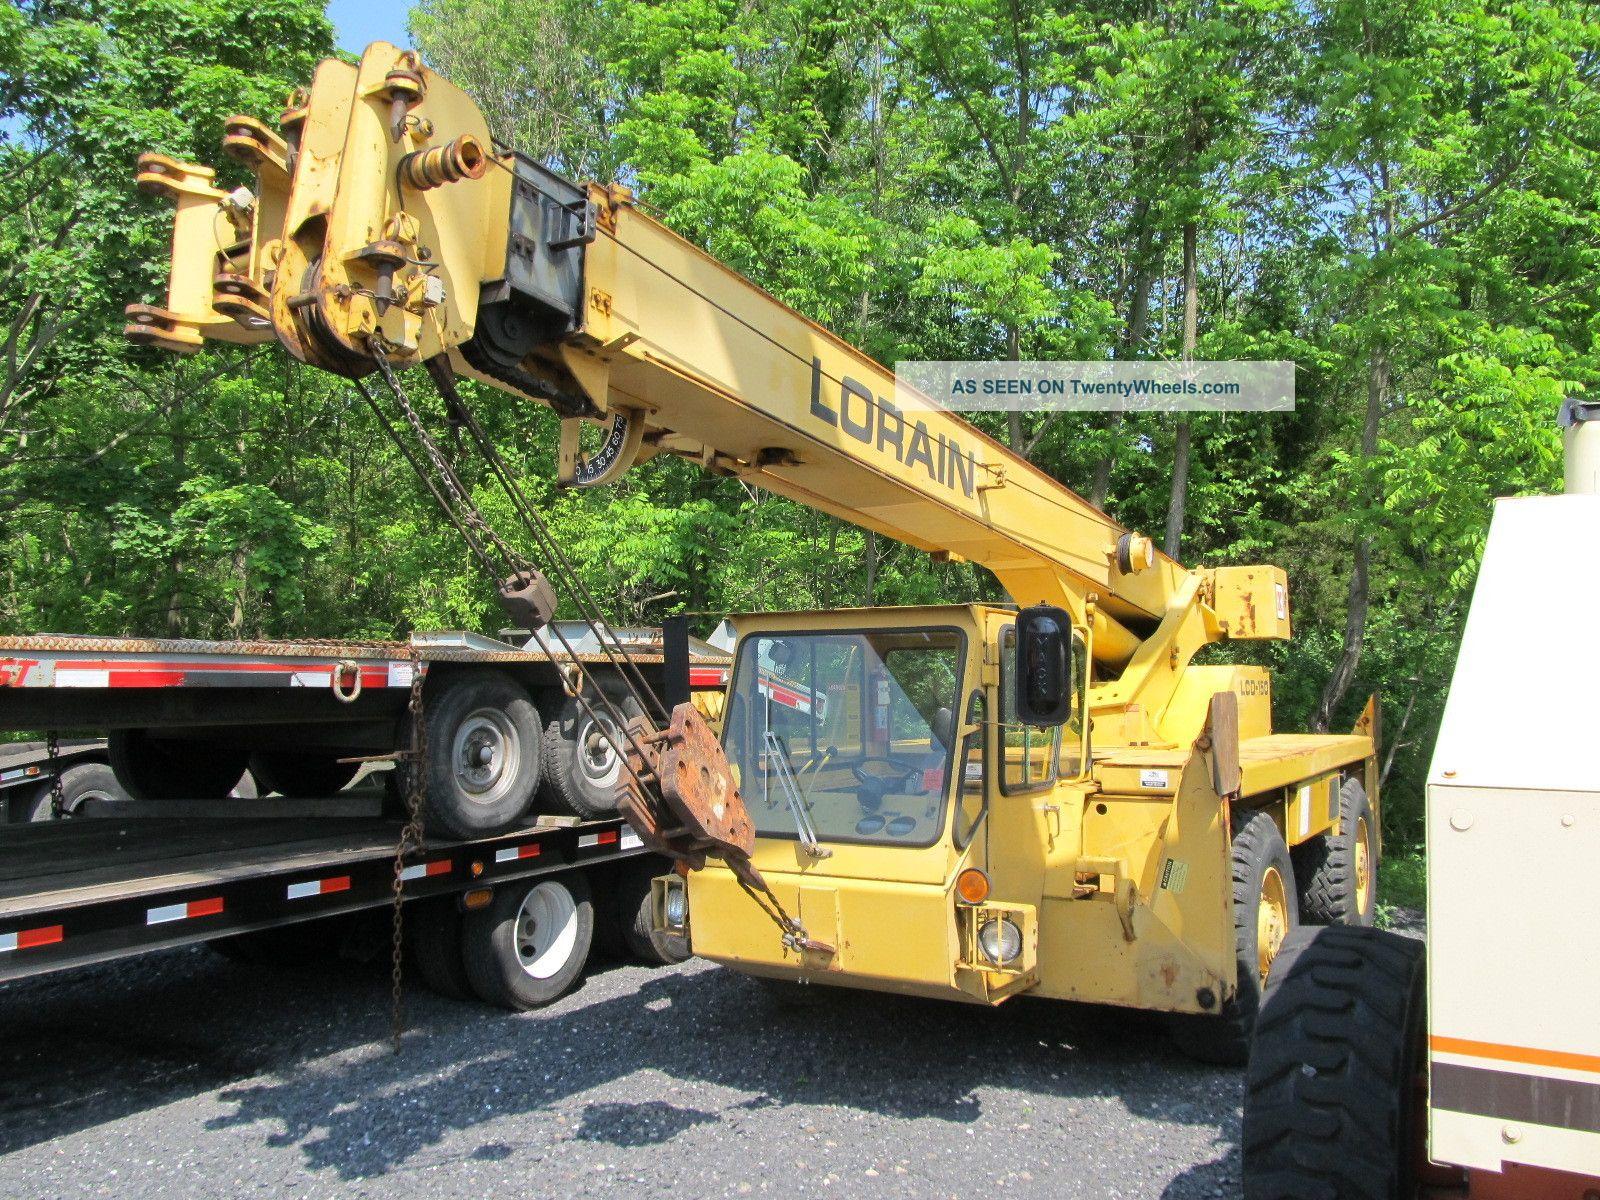 1989 Lorain Lcd150 Truck Crane W/ 1,  767 Hours,  15 Ton Capacity,  15 ' Jib Cranes photo